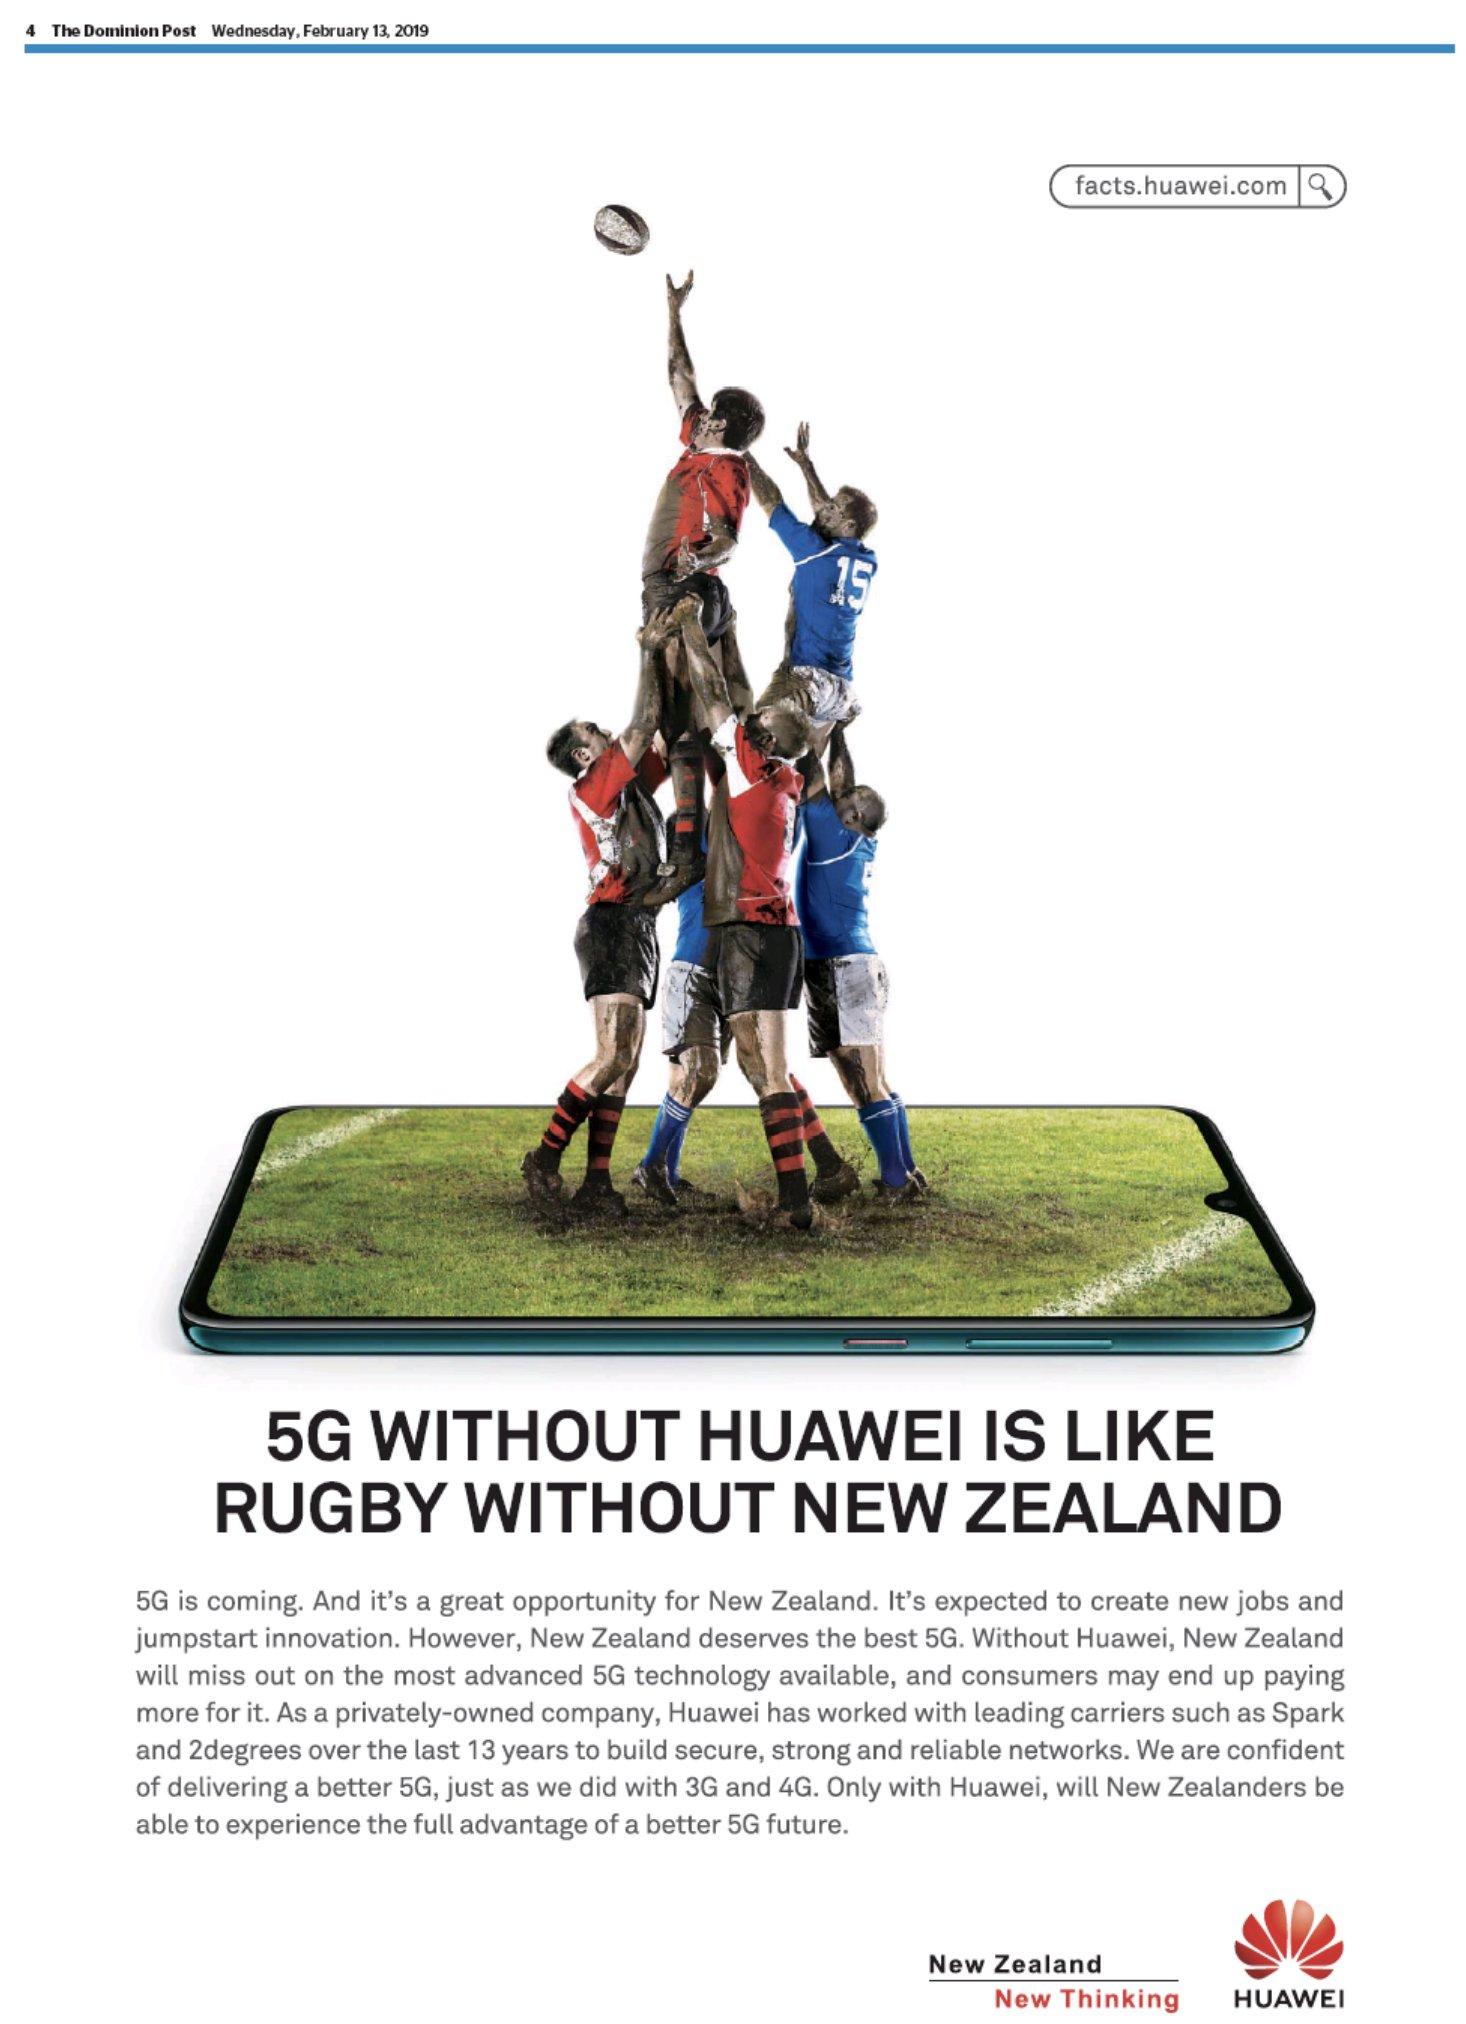 Huawei rugby noua zeelanda